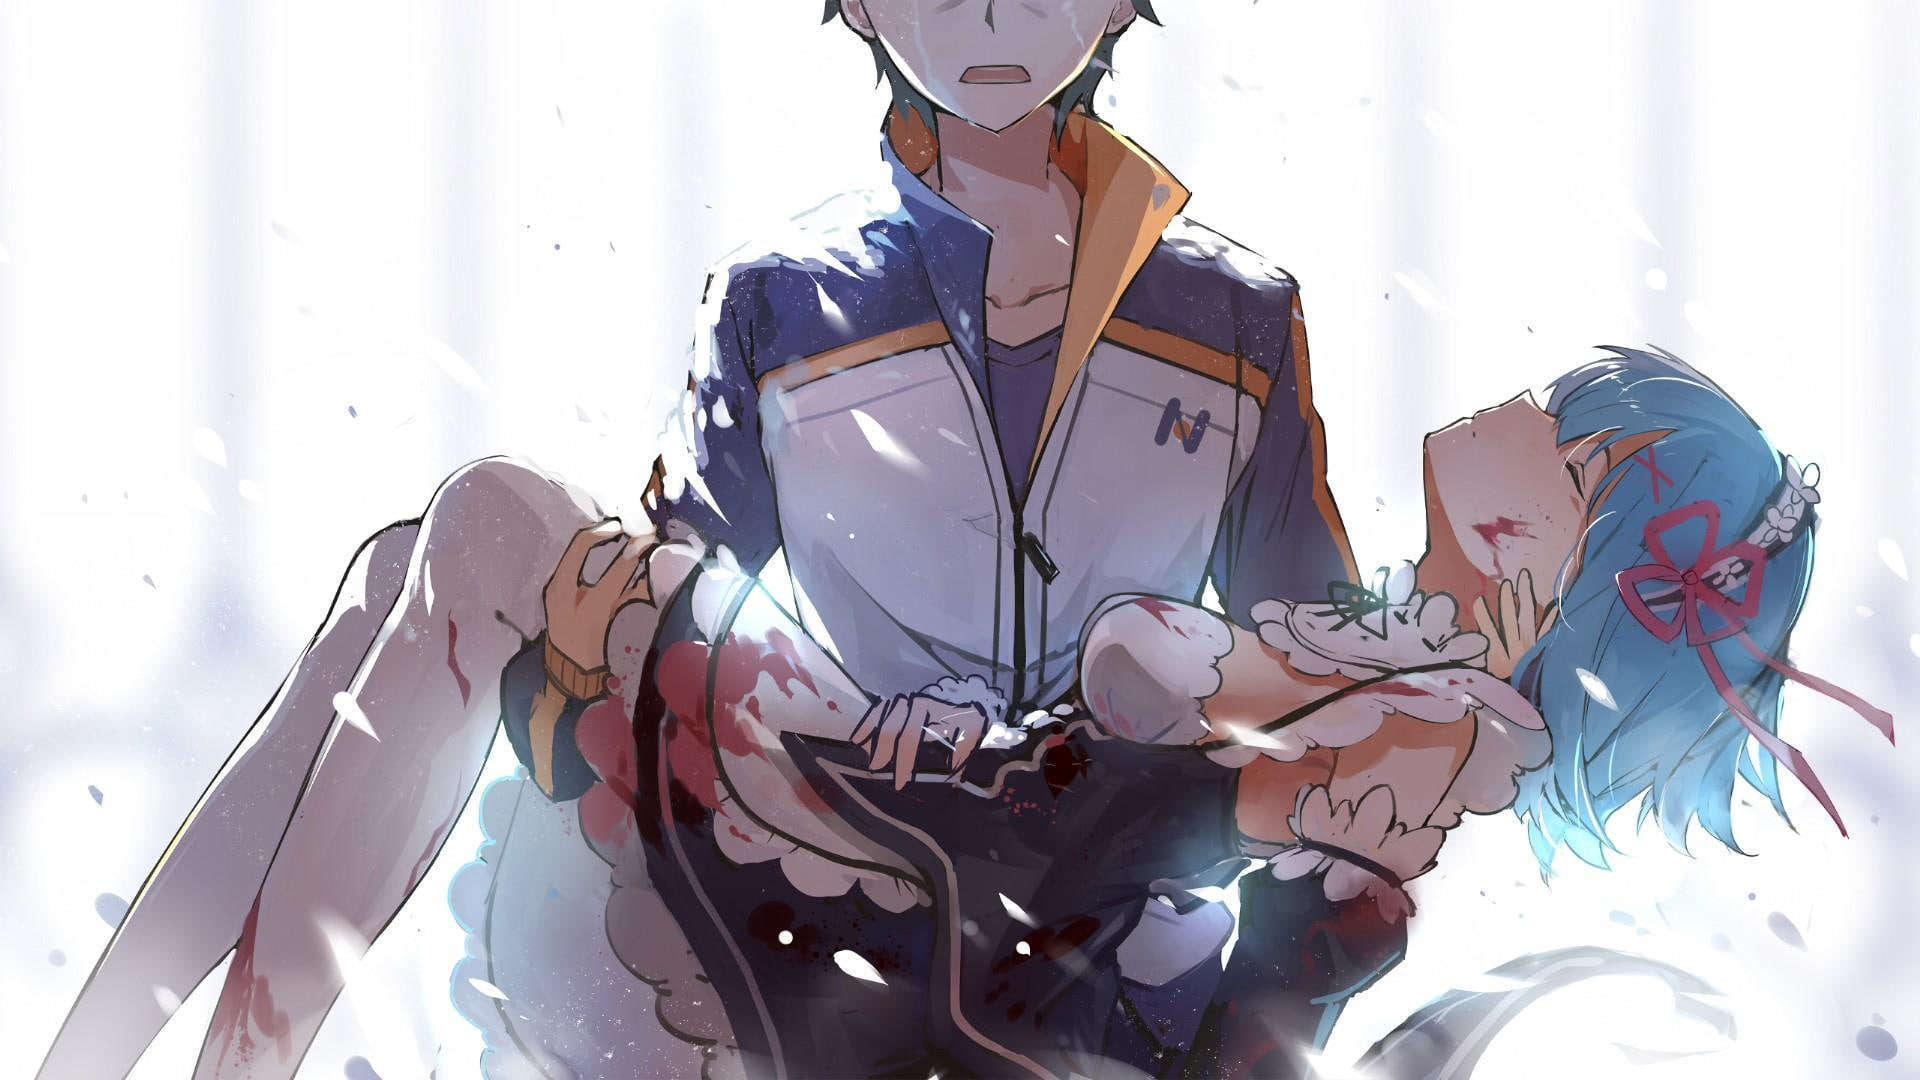 Gambar anime desktop rem